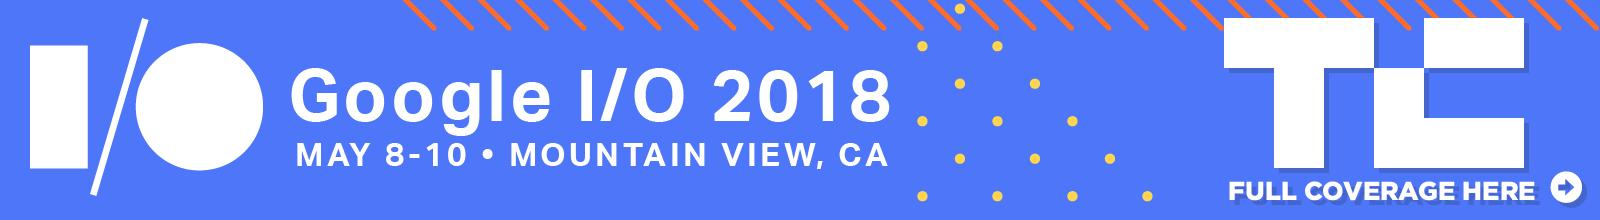 google io 2018 banner 9